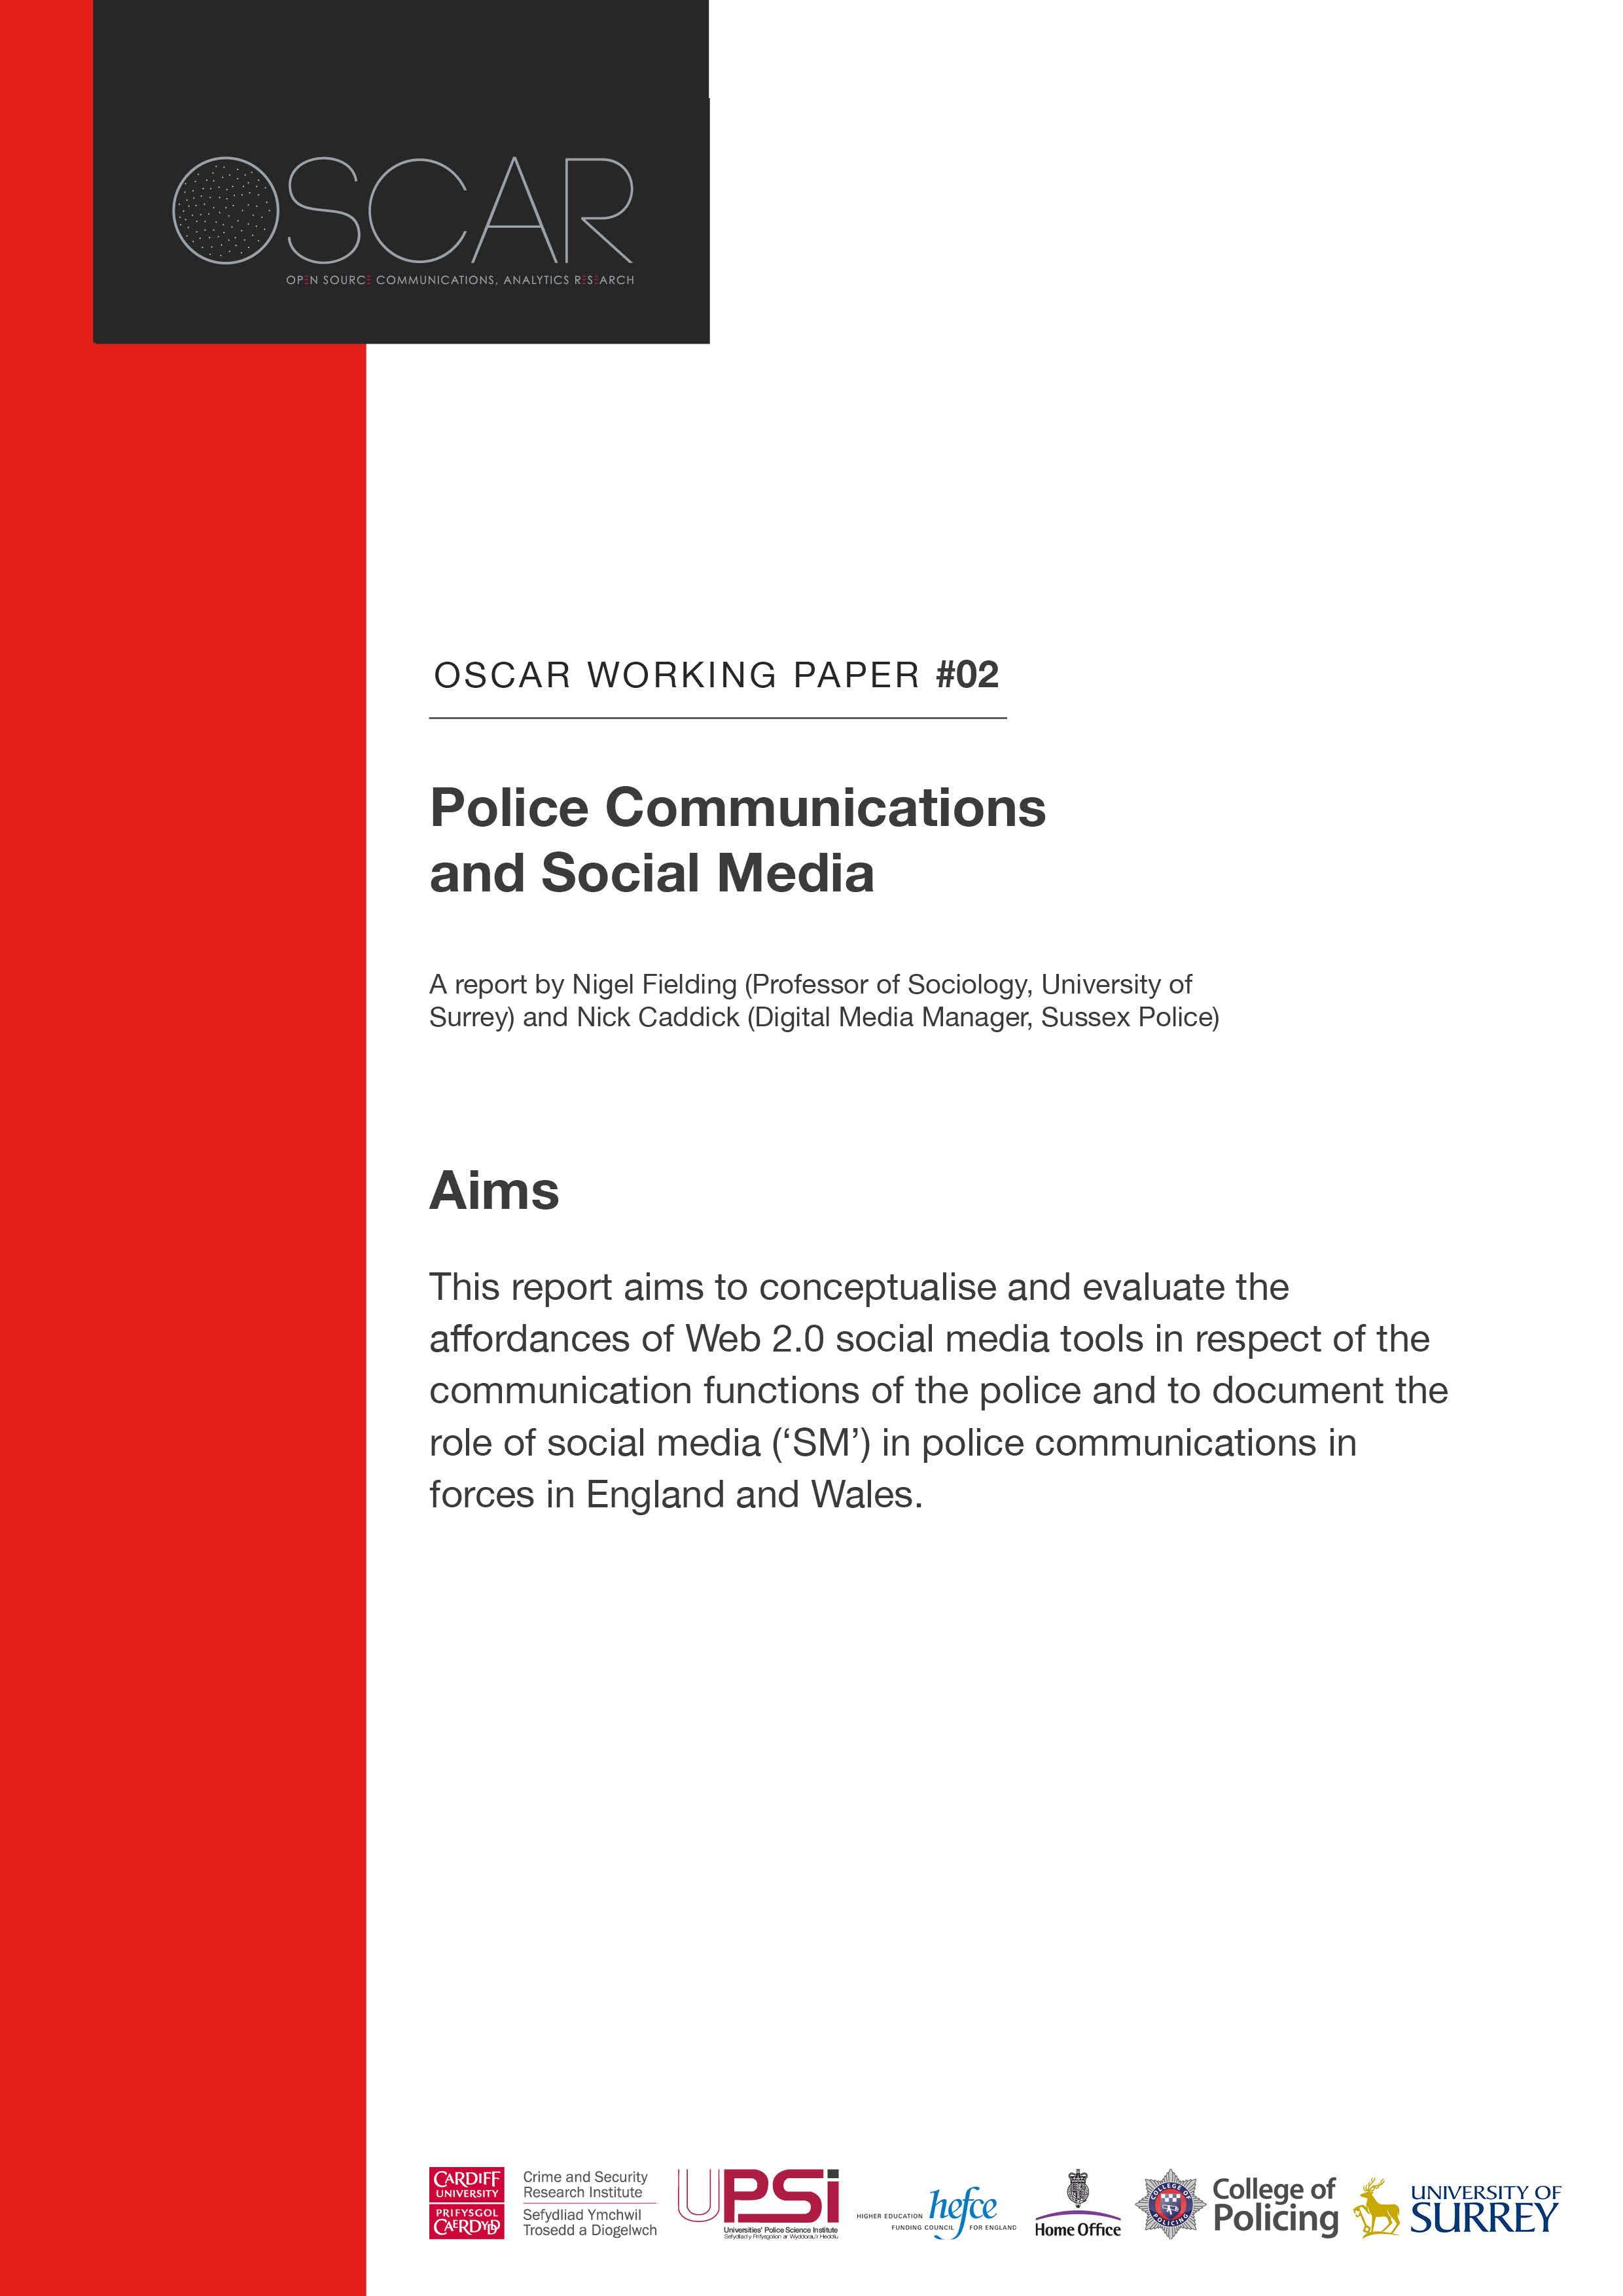 OSCAR WP2 Police Communications & Social Media Cover.jpg